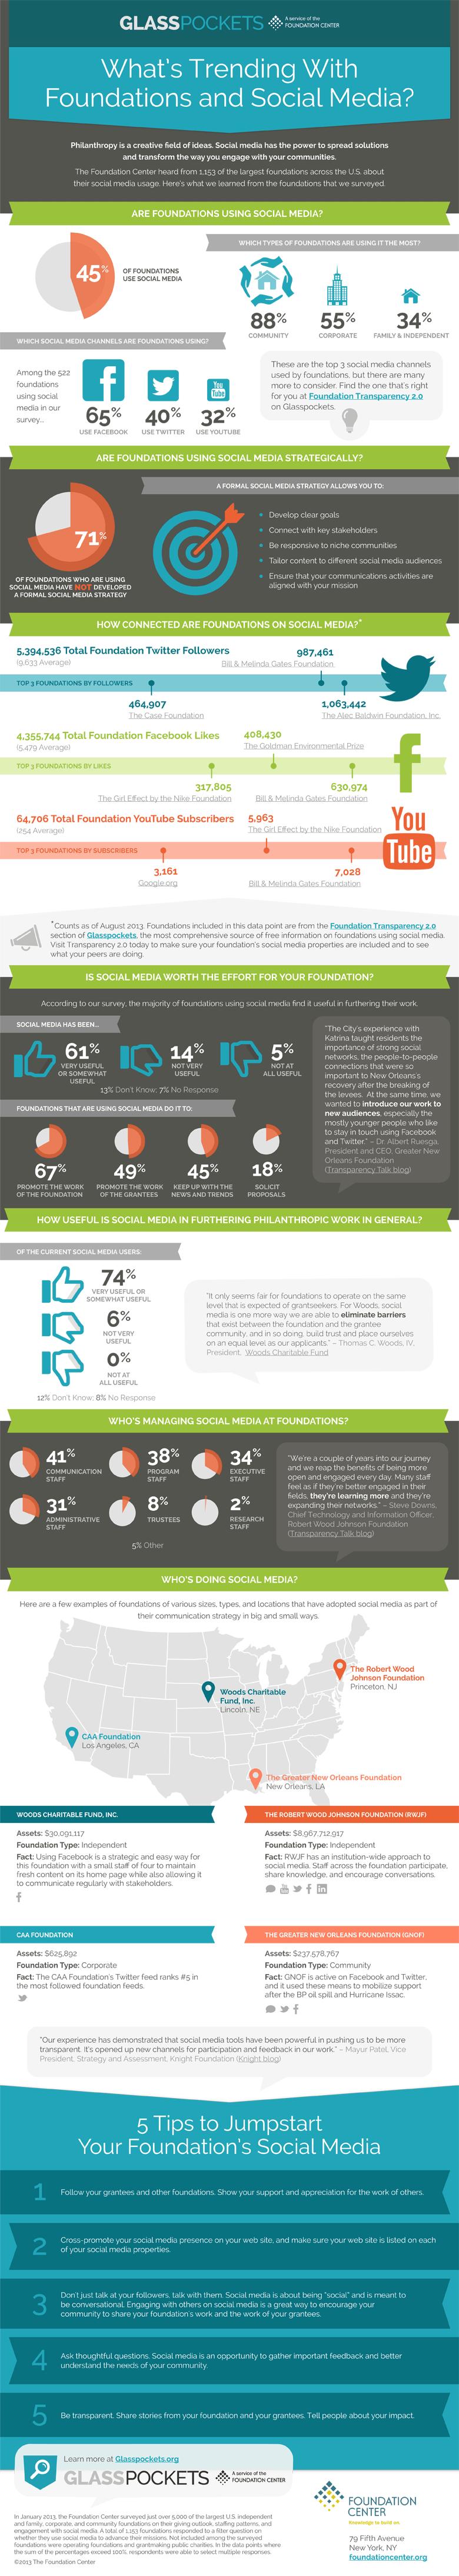 Are Foundations Using Social Media Strategically [INFOGRAPHIC]   #SocialMedia #infographic #Foundations